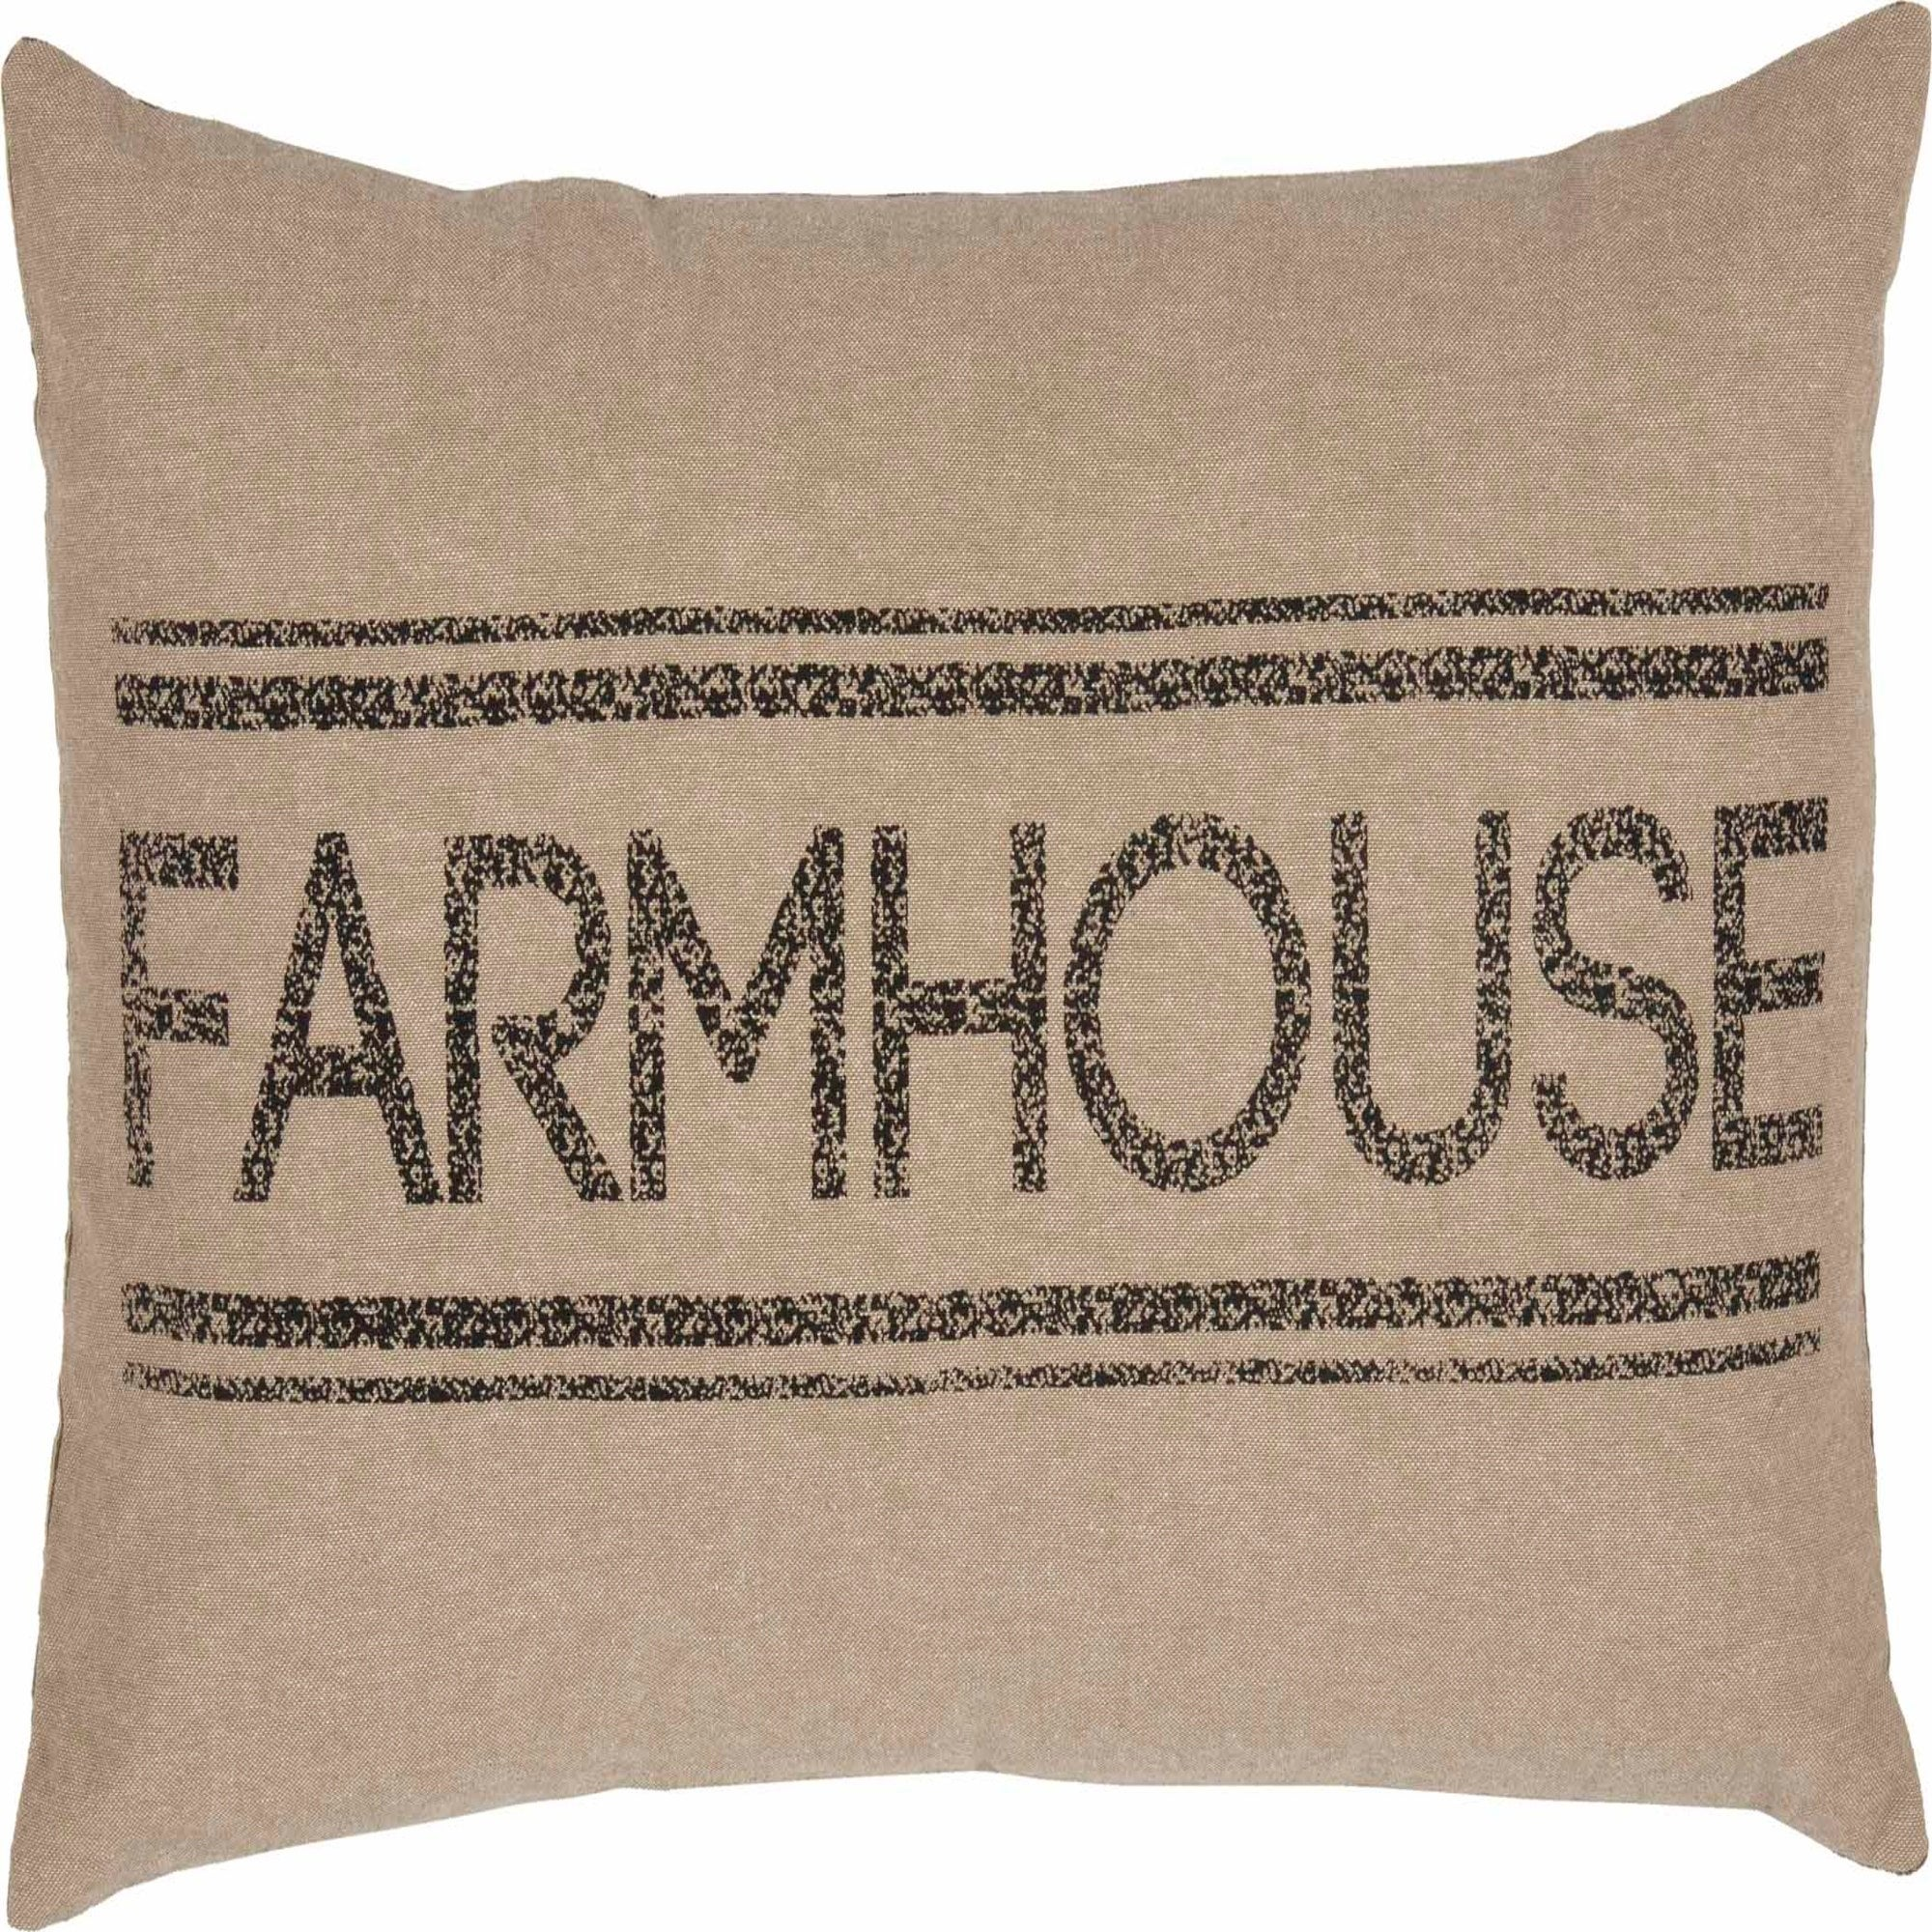 "New SAWYER MILLS Farm House Word RED FARMHOUSE LIVING GRAIN SACK PILLOW 22/"""